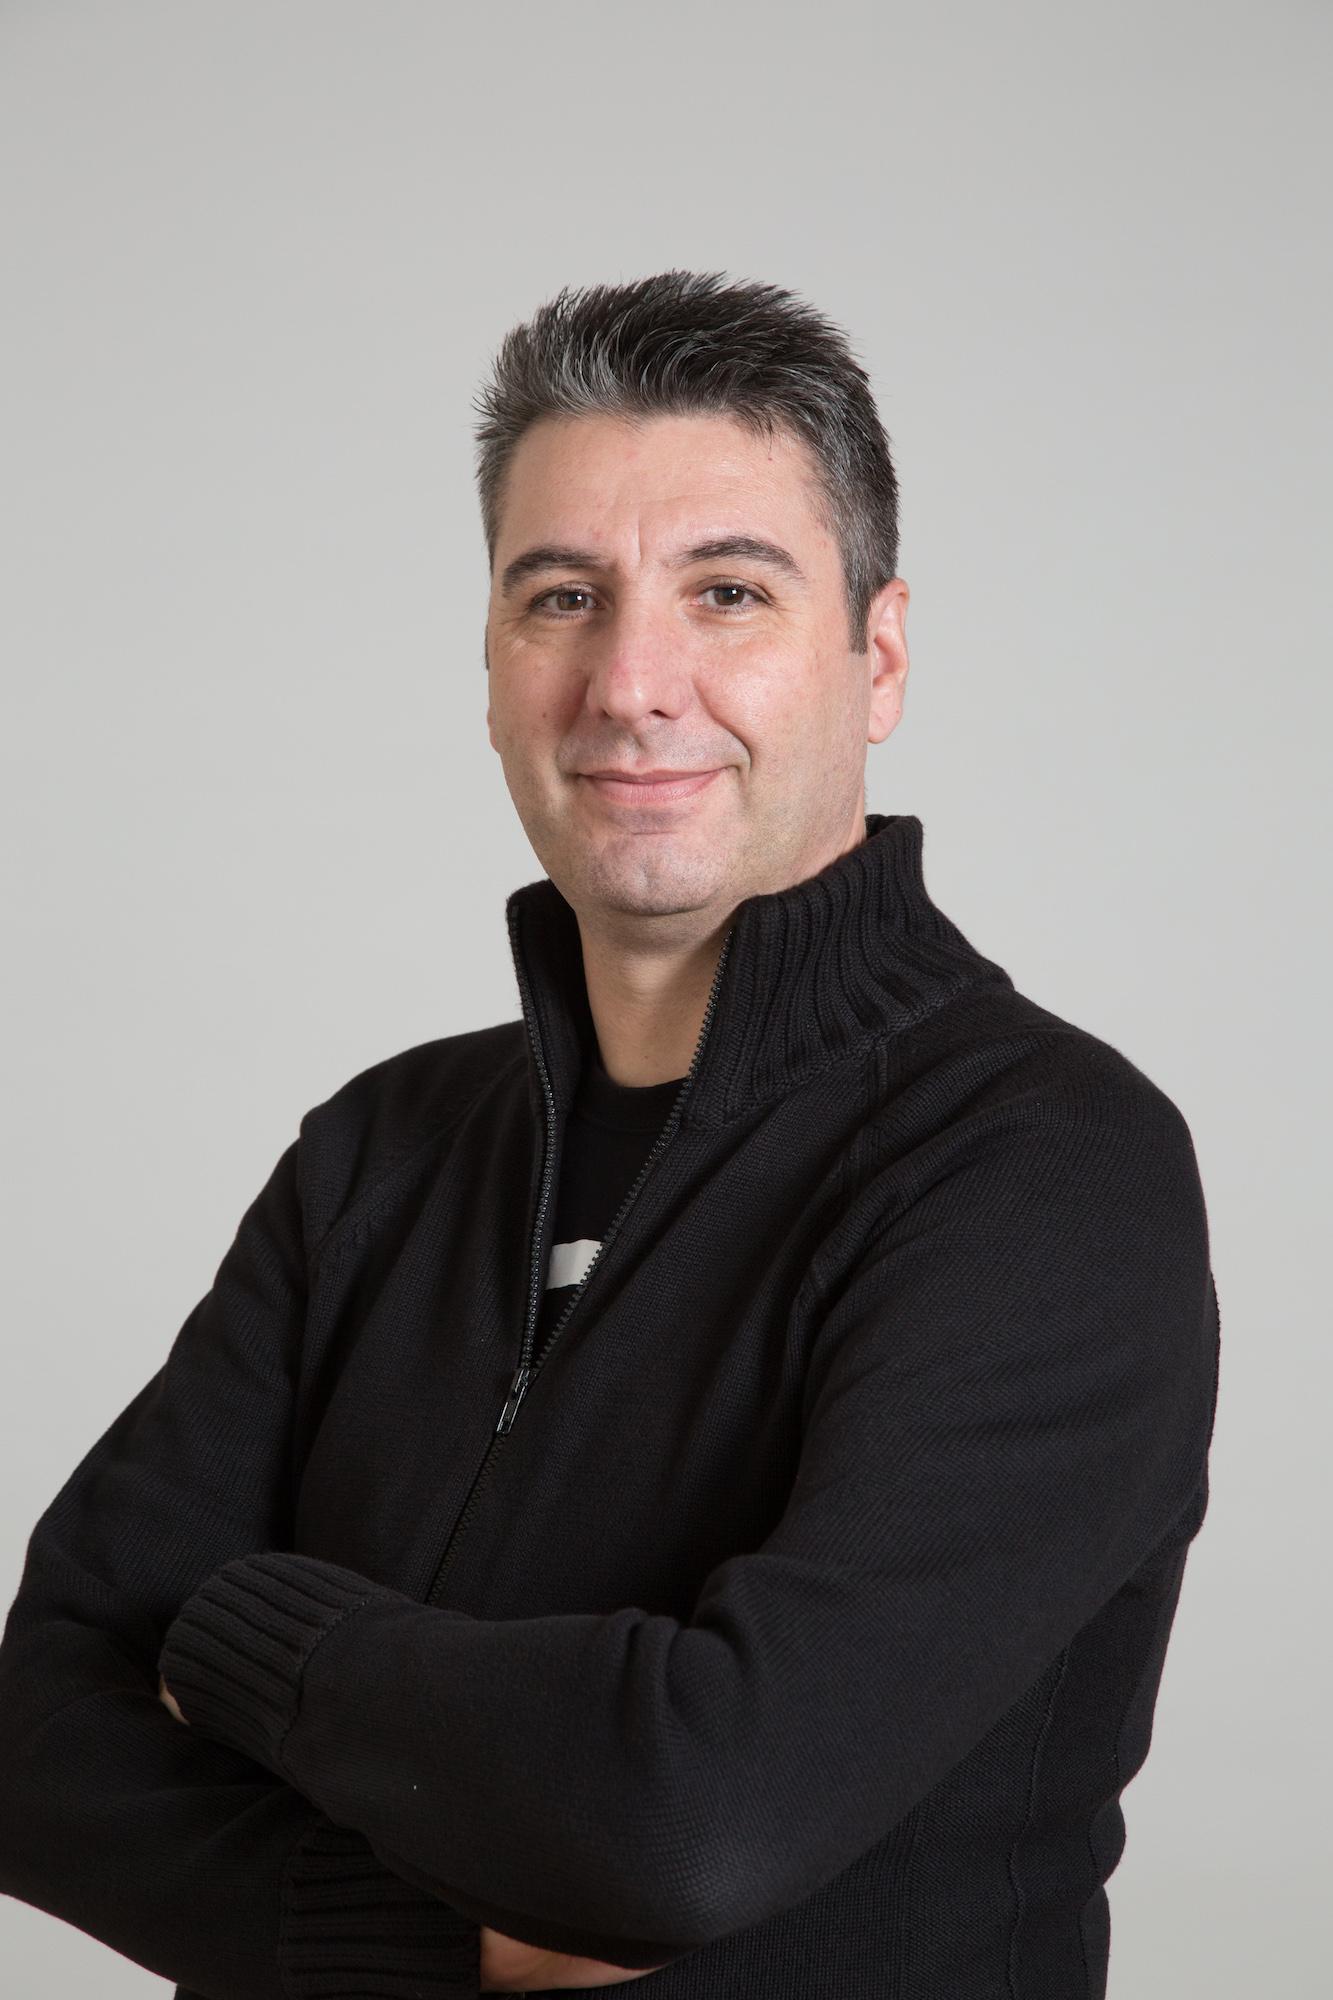 Photo of Michael Bugeja